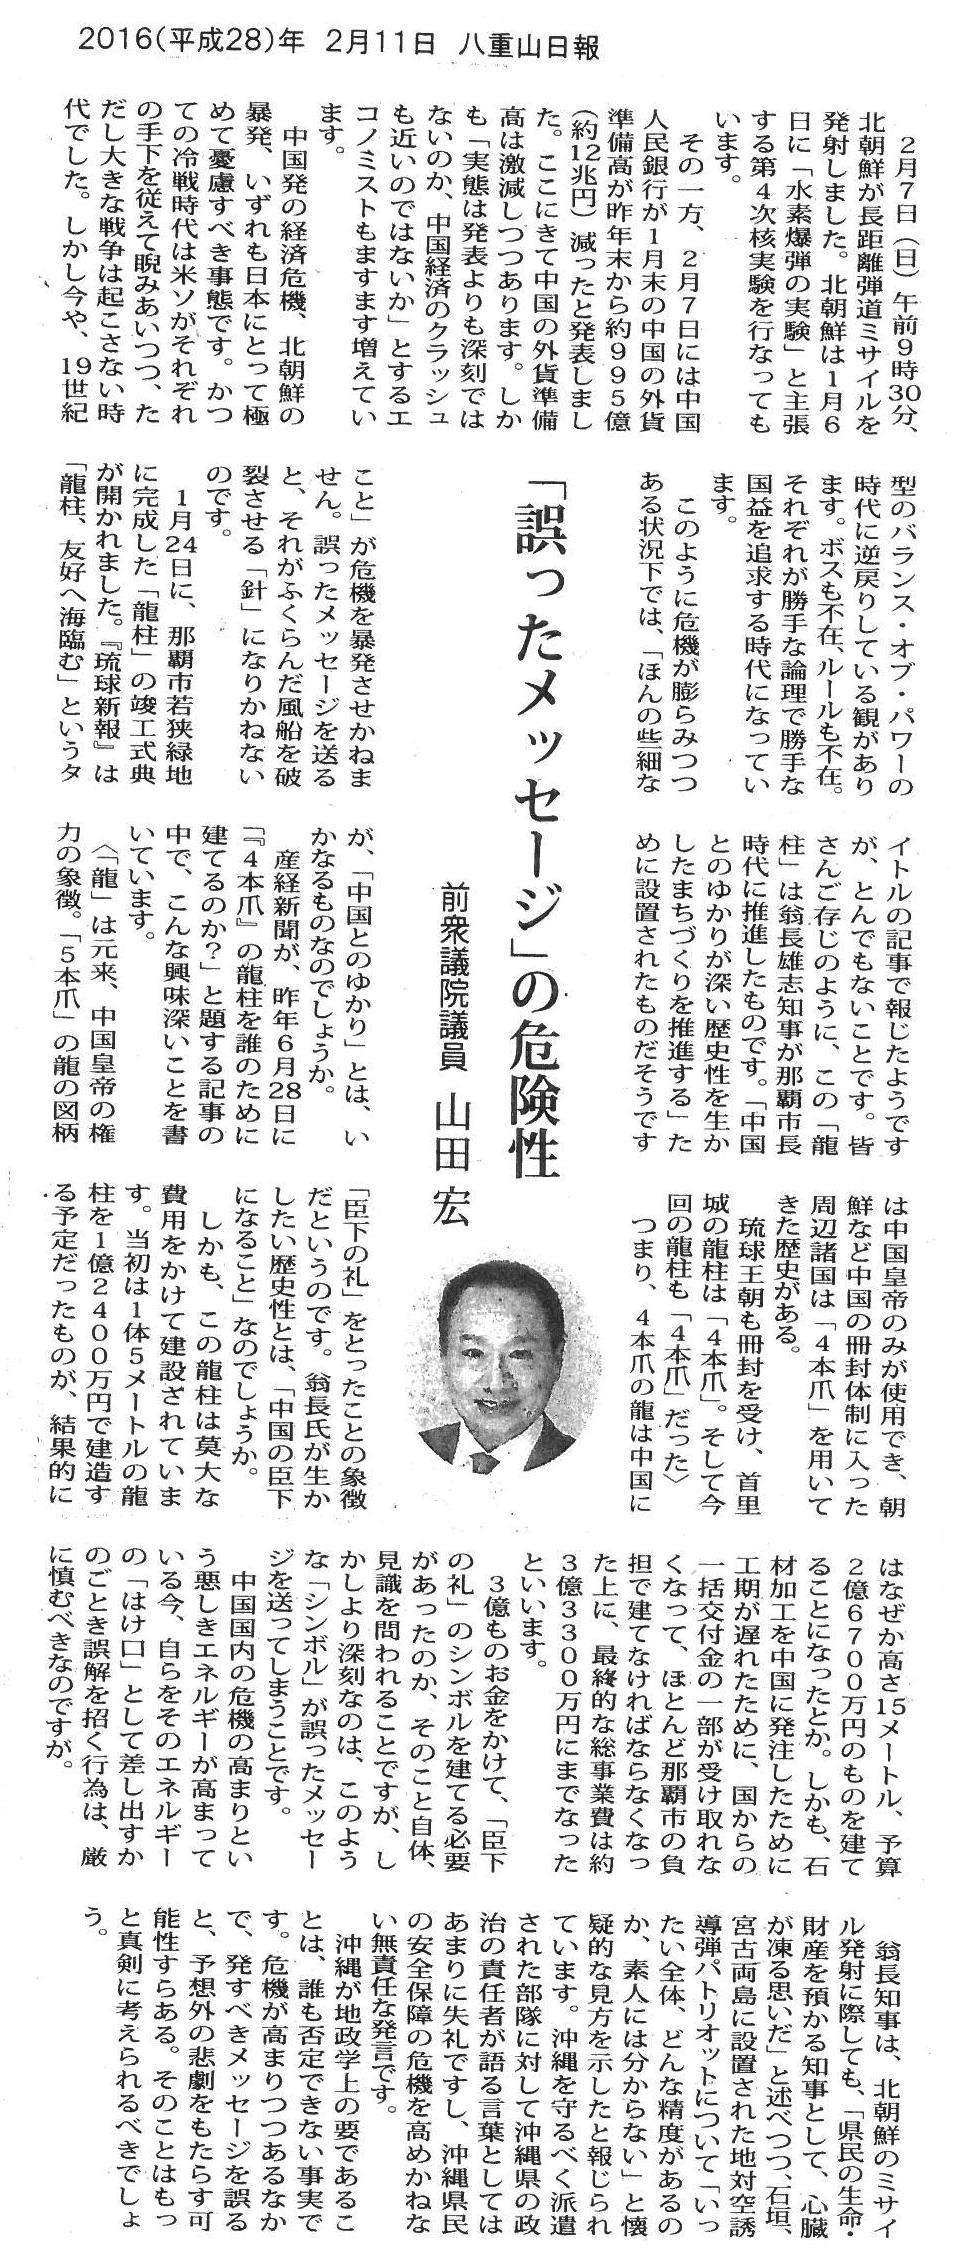 yaeyama201602